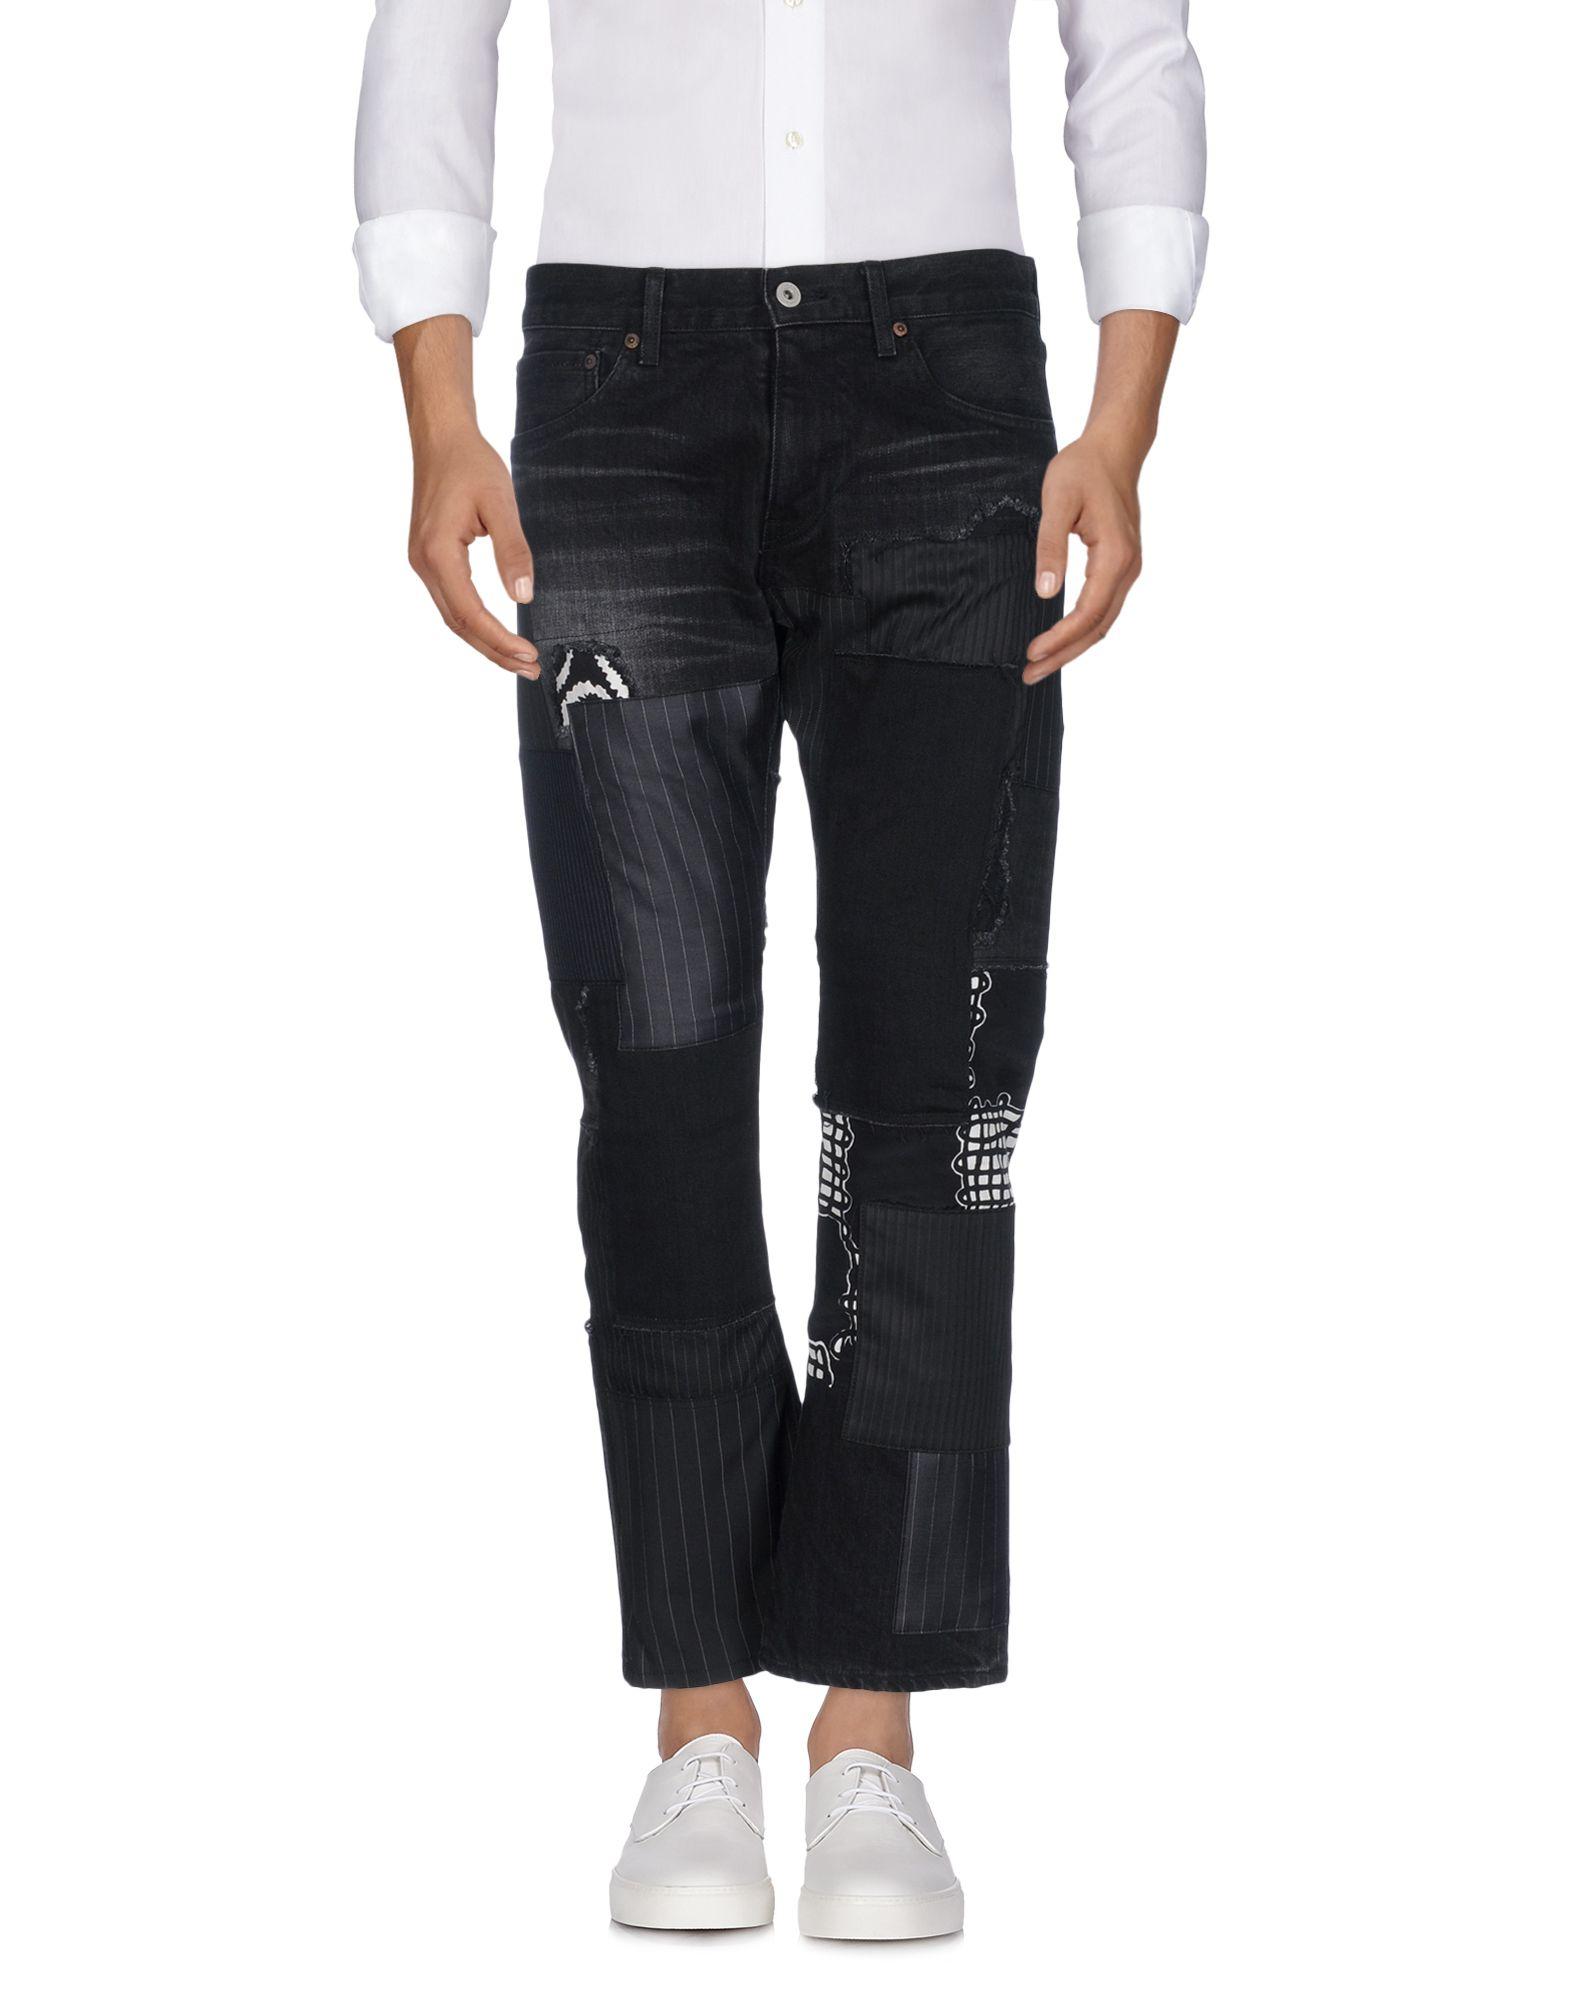 Pantaloni Jeans Junya Watanabe Comme Des Garçons Man Uomo - Acquista online su